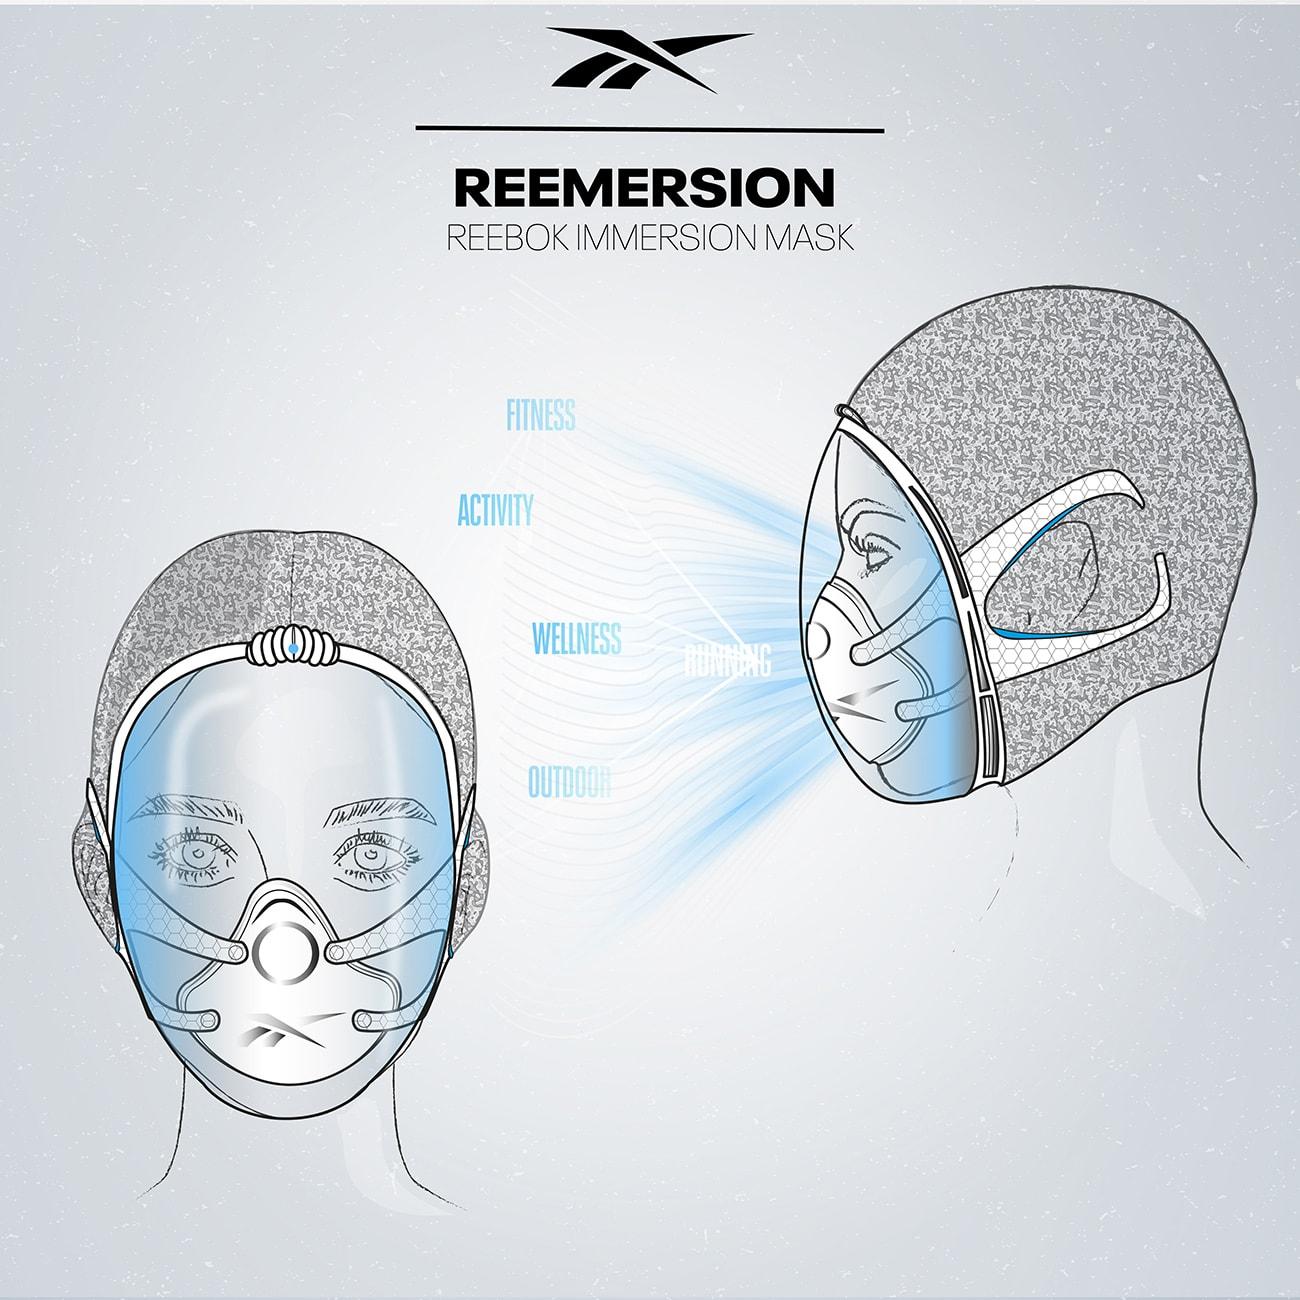 Mask_REEMERSION